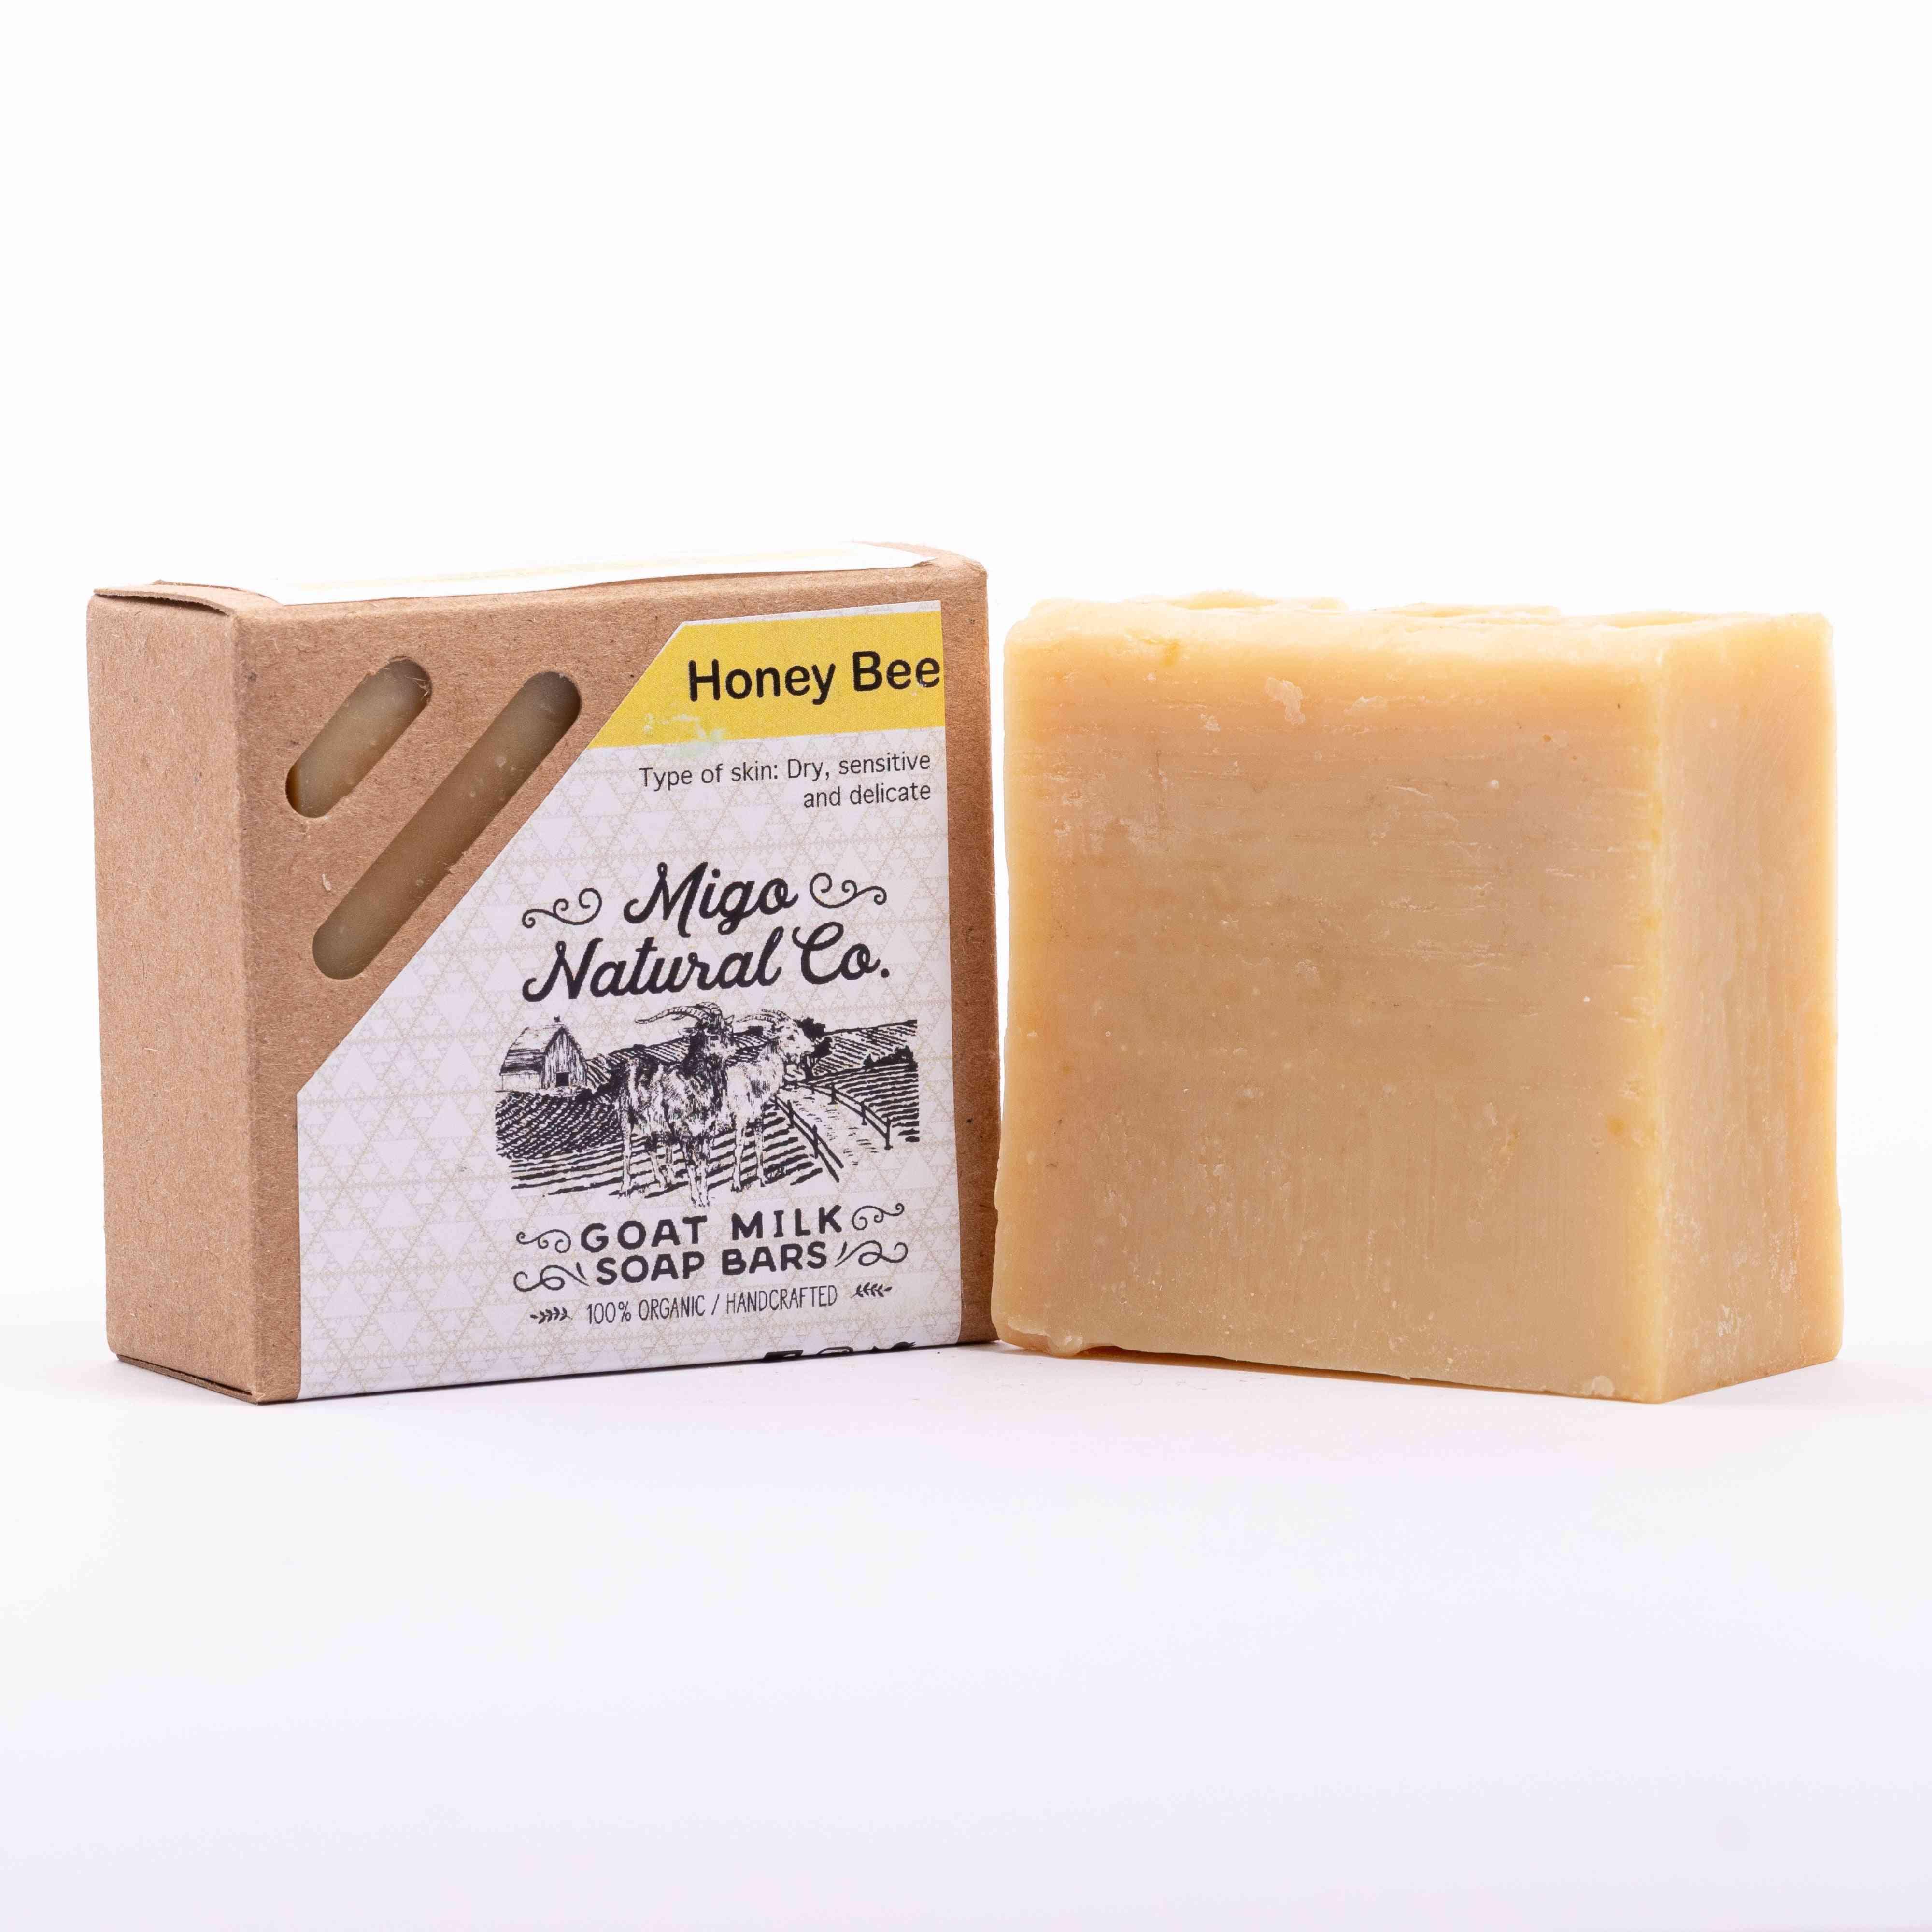 Honey Bee Goat Milk  Soap